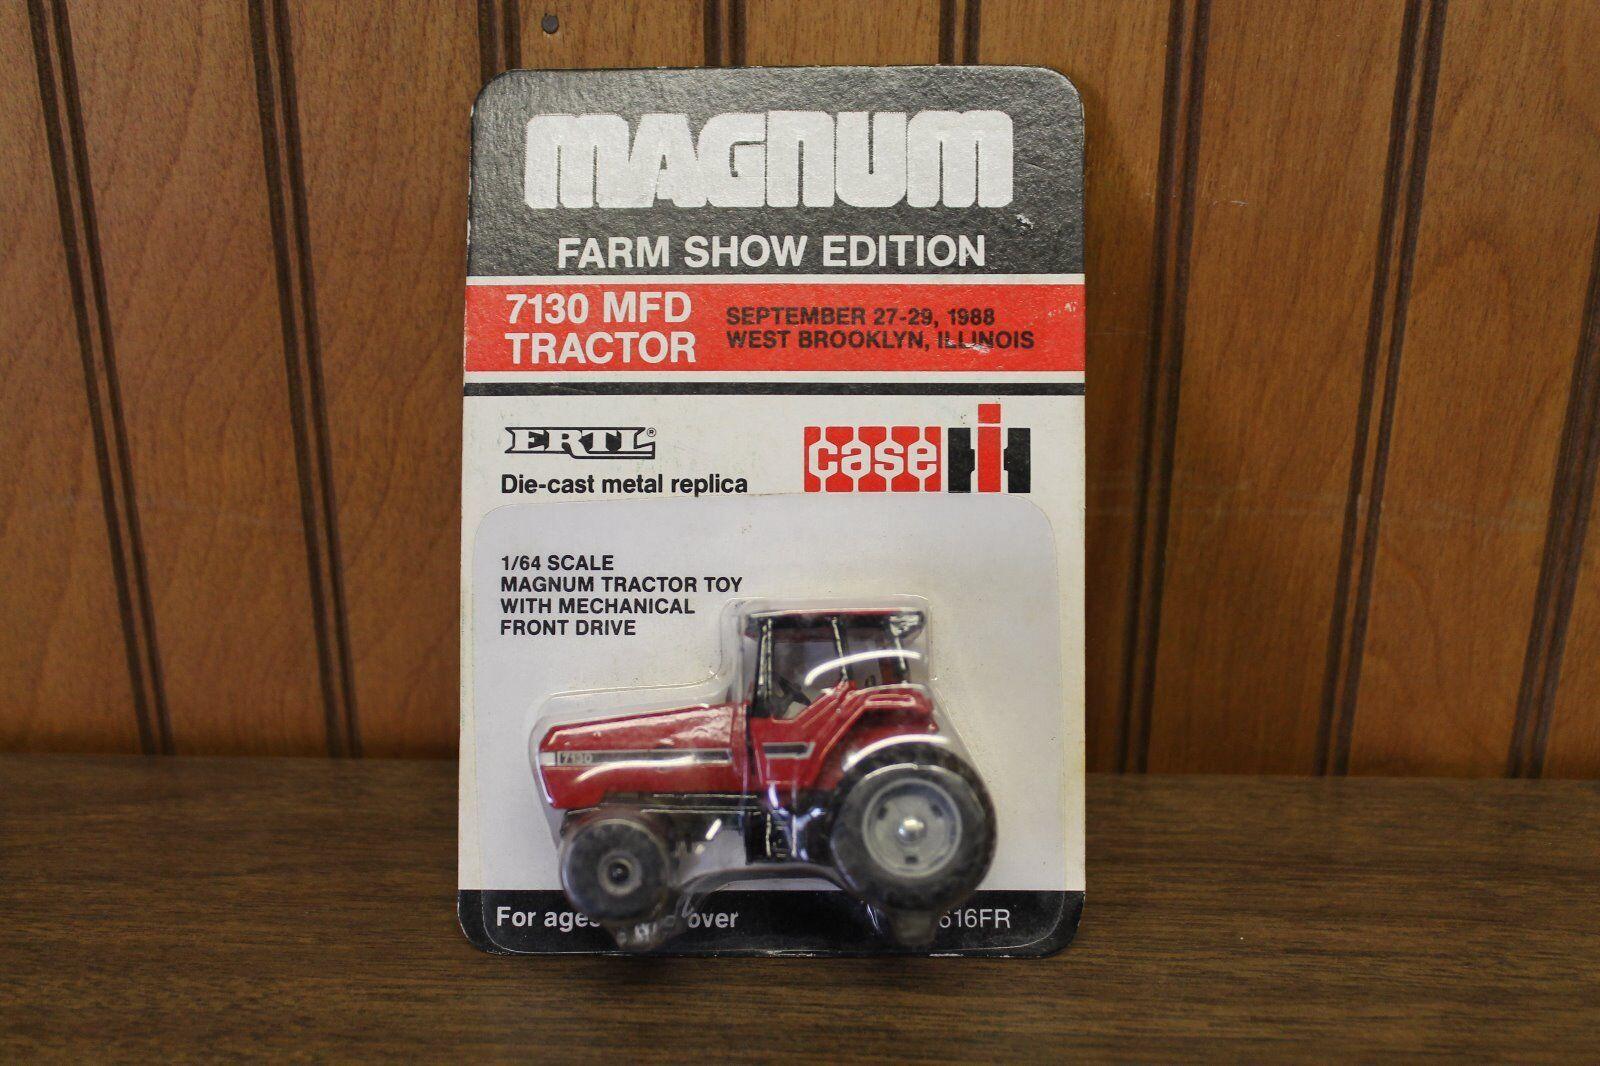 Magnum, Farm Show Edition, Case International 7130 MFD, Scale 1 64, ERTL,Diecast